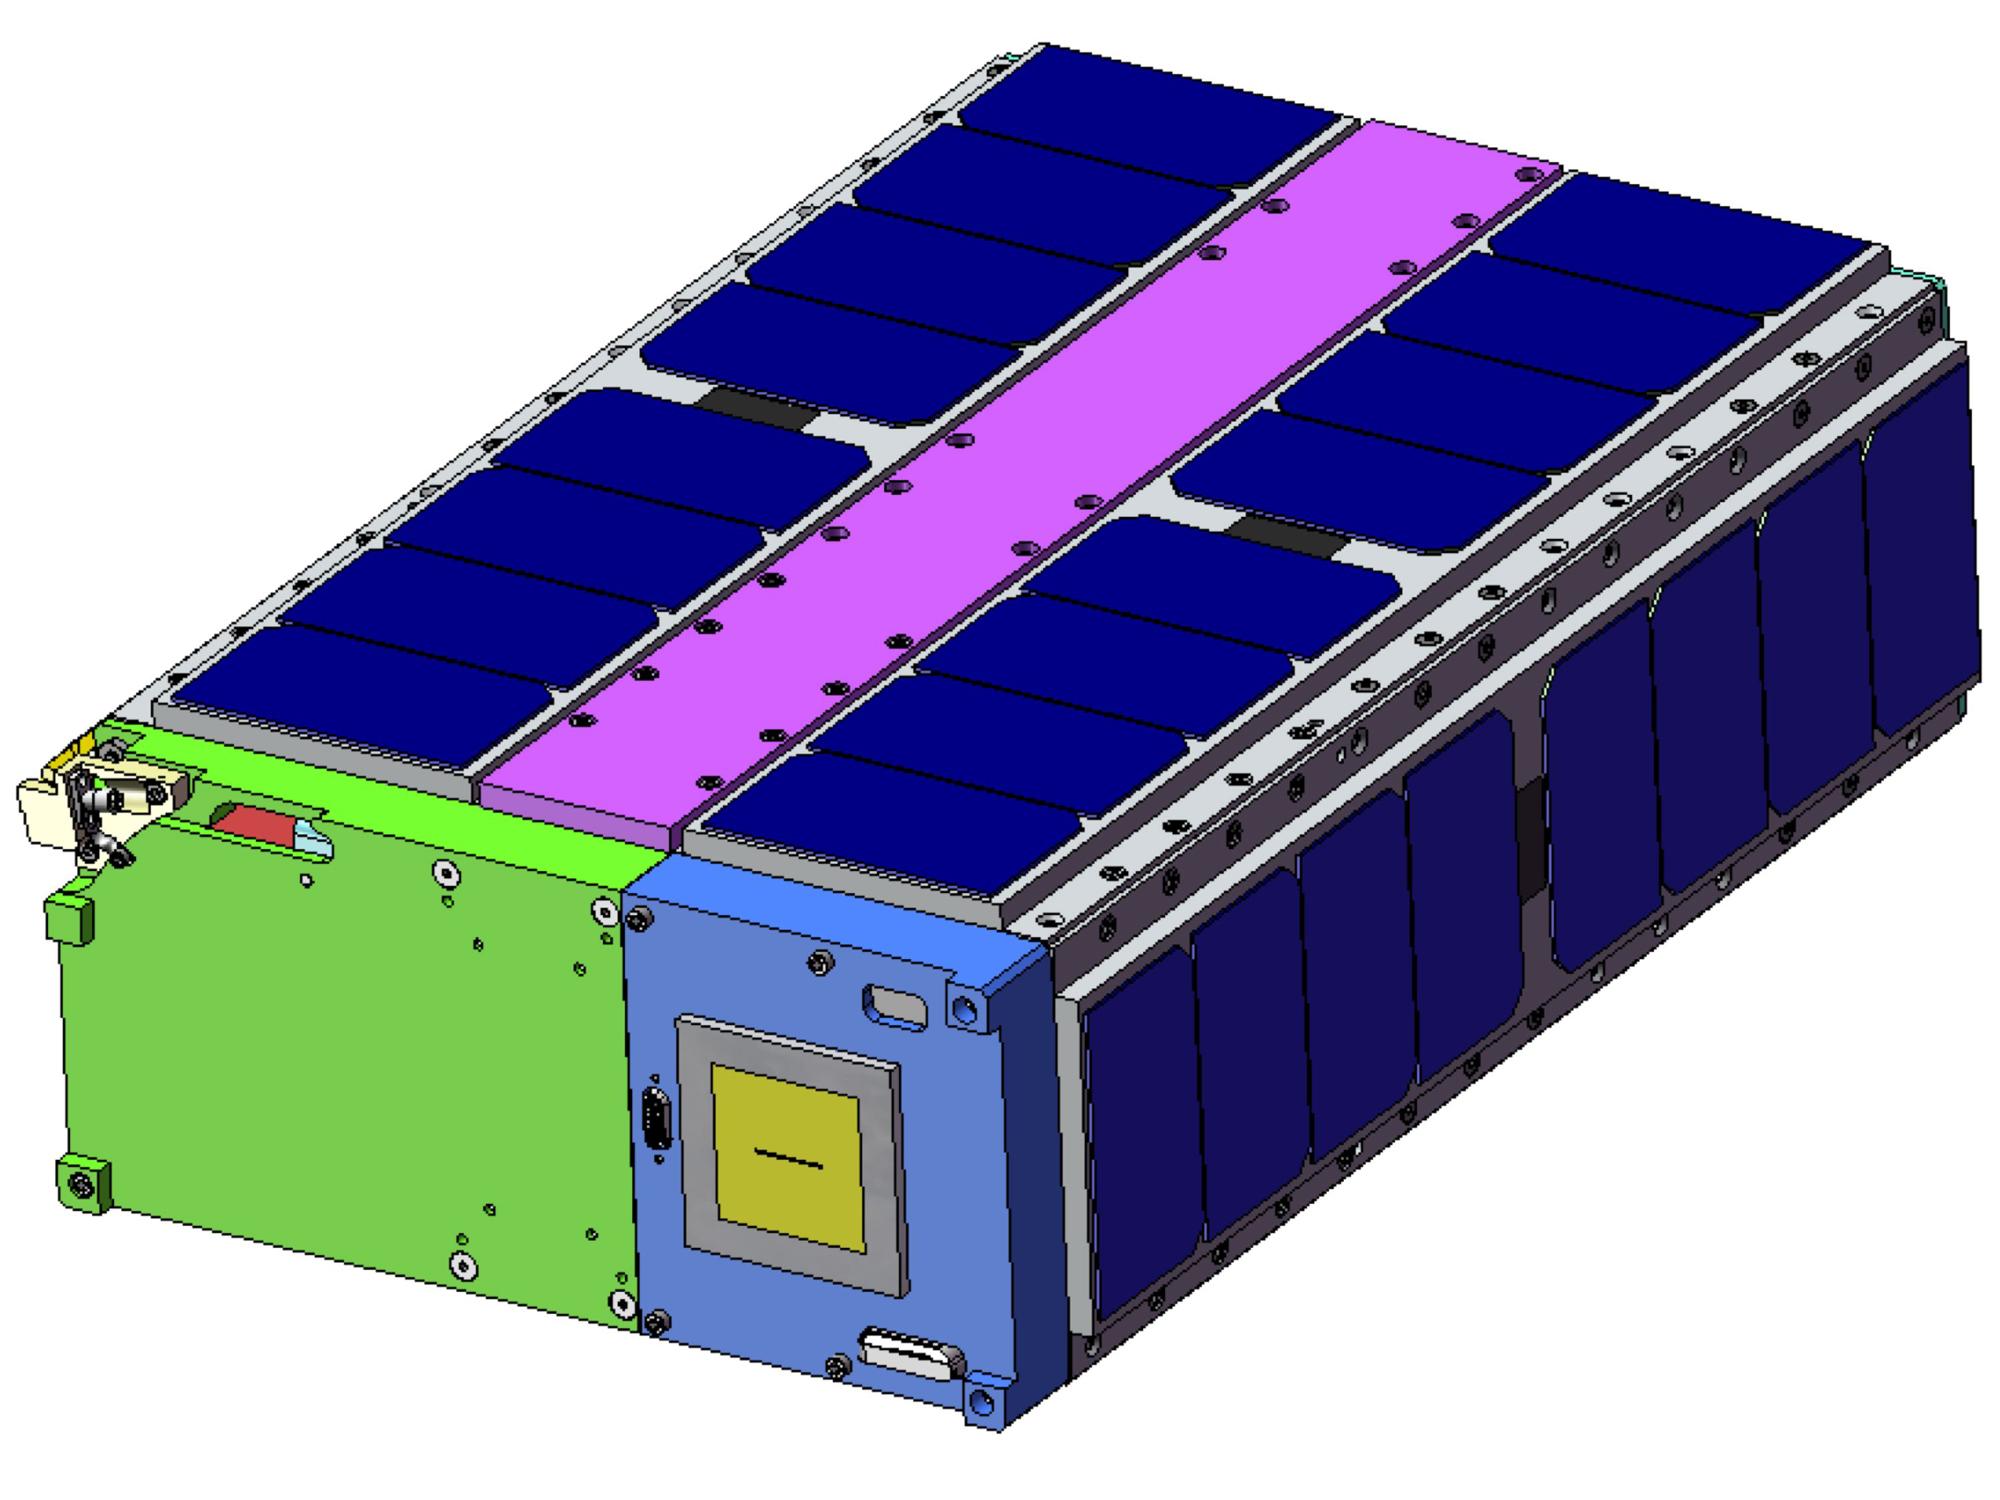 Ames' E. coli small satellite study selected for flight